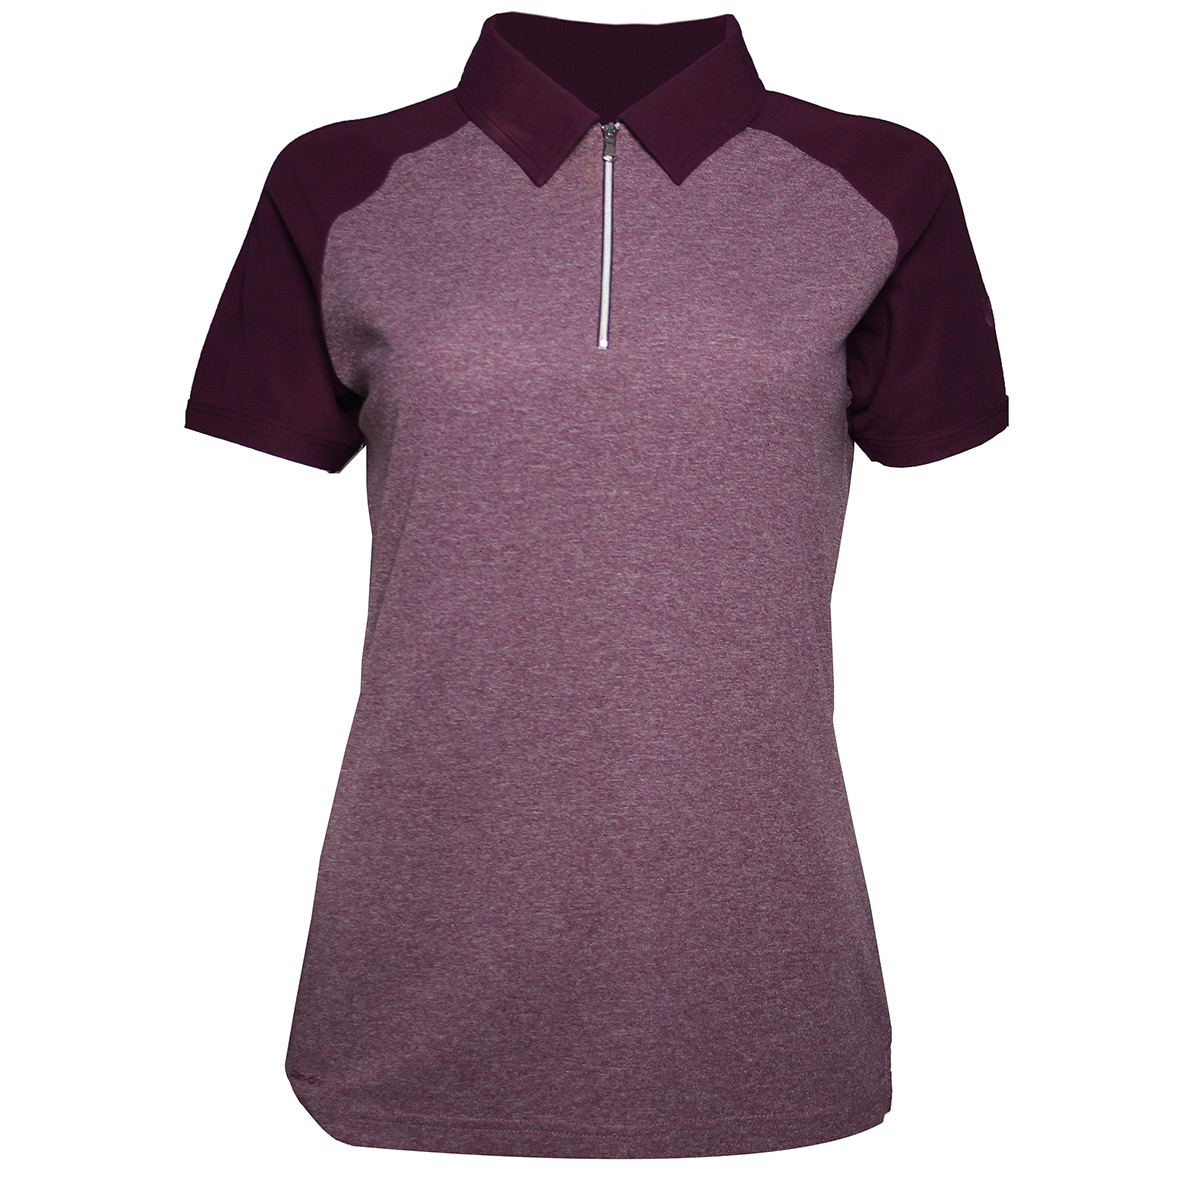 Palm Grove Zip Neck Ladies Polo Shirt